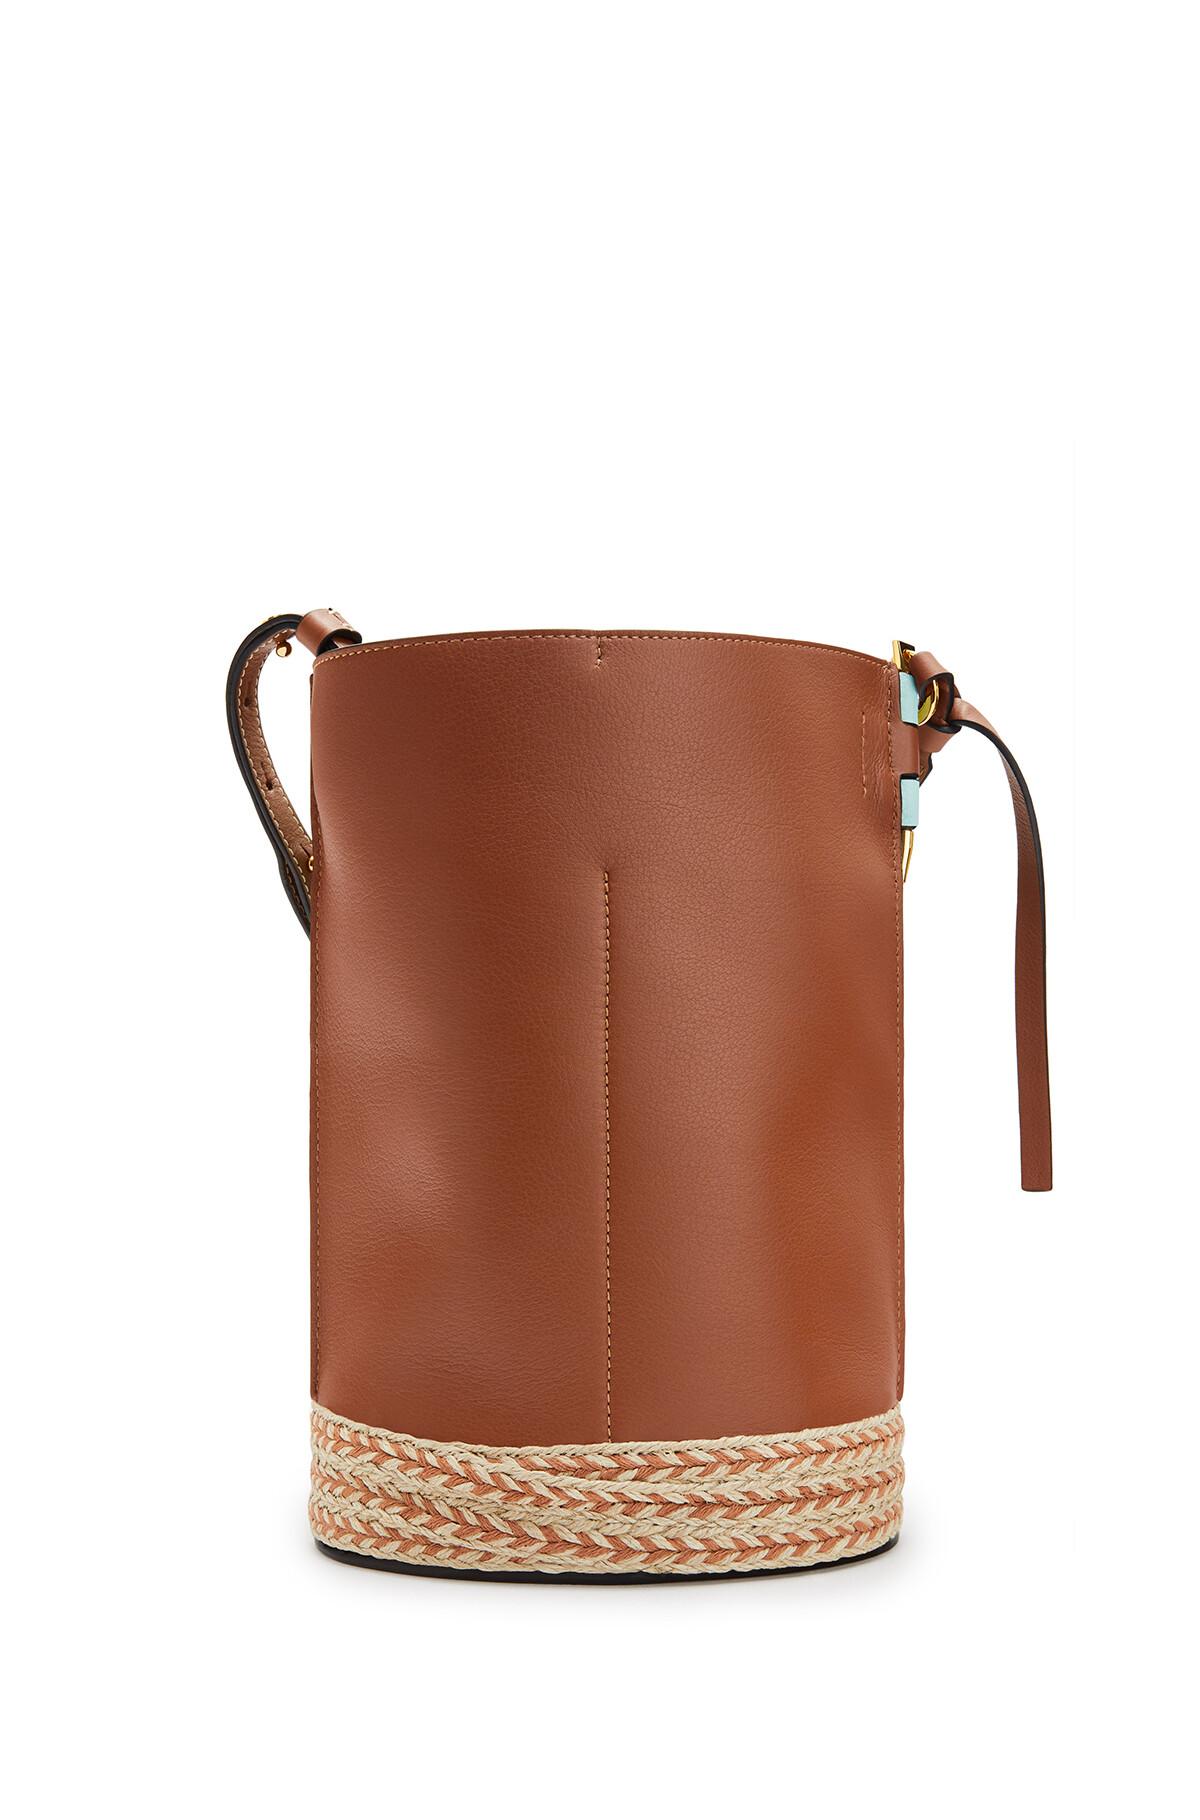 LOEWE Gate Bucket Bag In Raffia And Soft Grained Calfskin Mint/Tan front